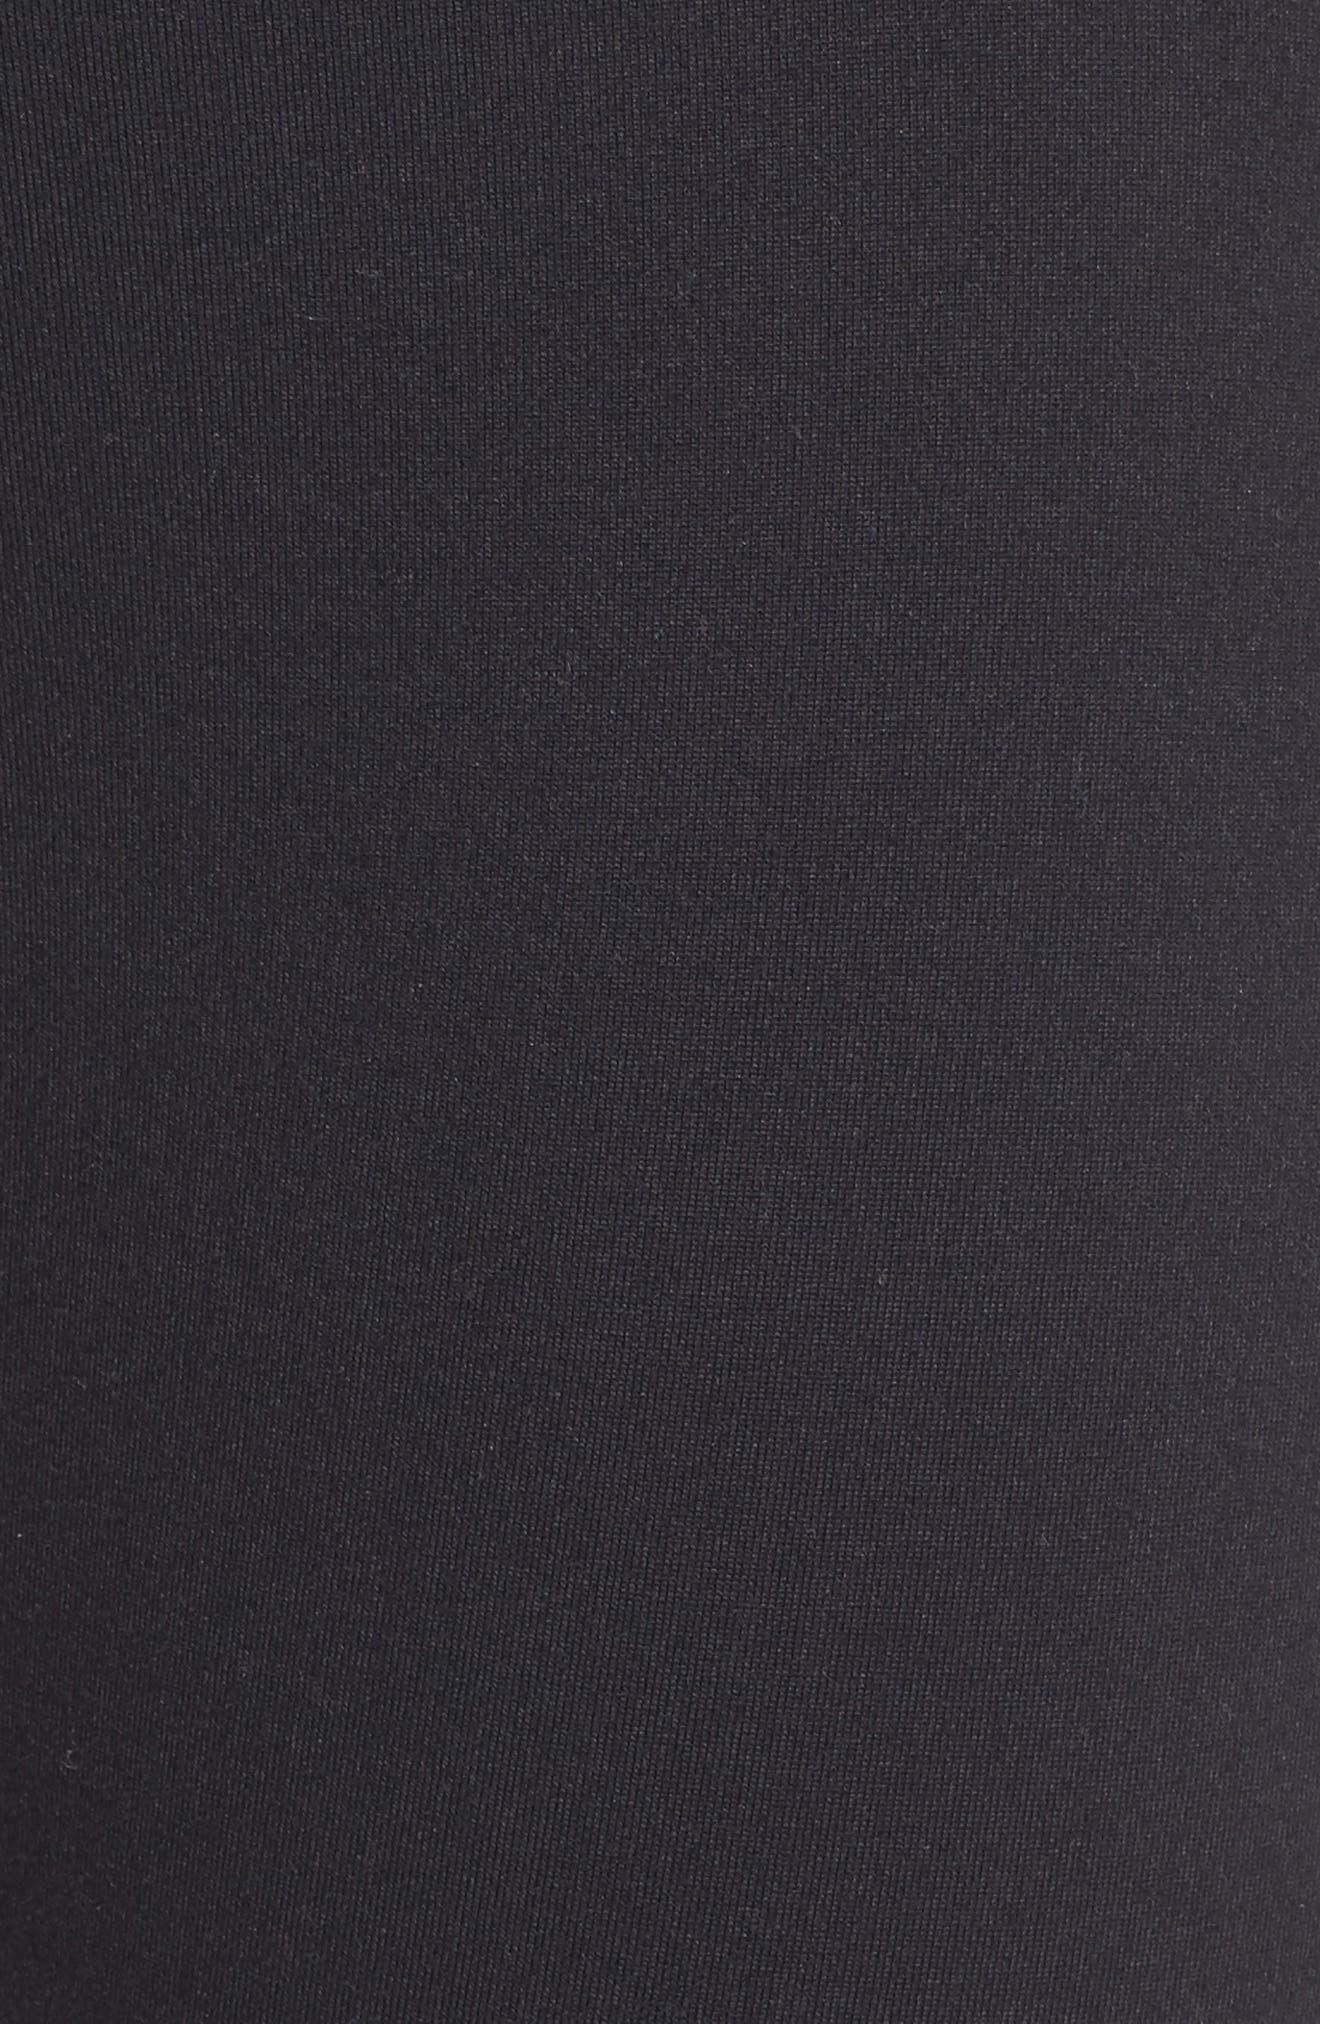 'Hatha' High Waist Crop Leggings,                             Alternate thumbnail 6, color,                             BLACK